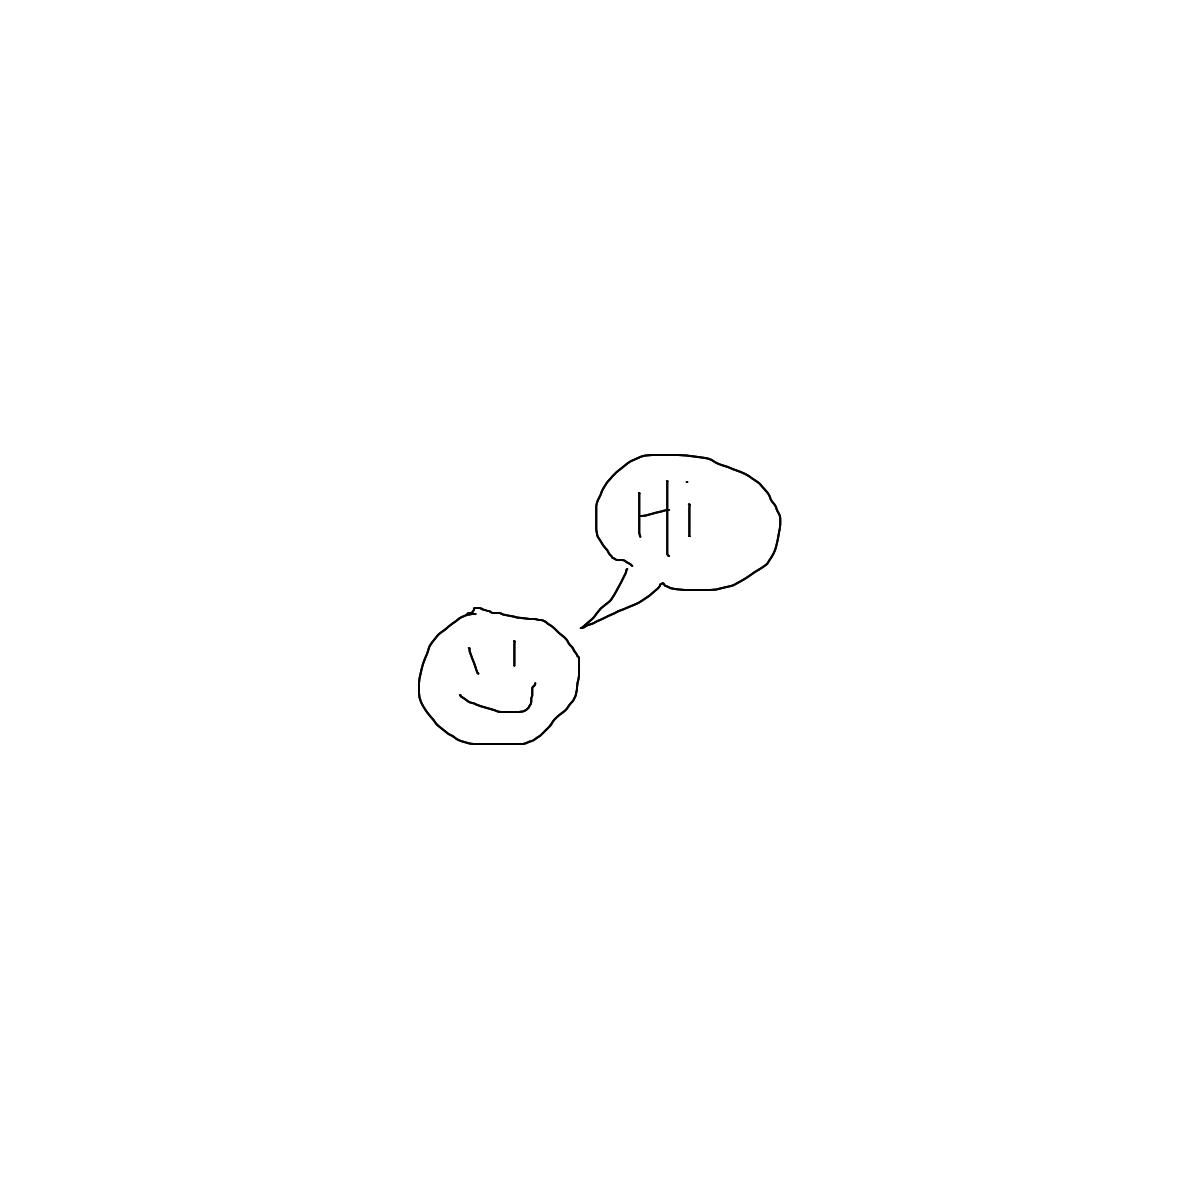 BAAAM drawing#677 lat:-35.2724800109863300lng: 138.4568481445312500